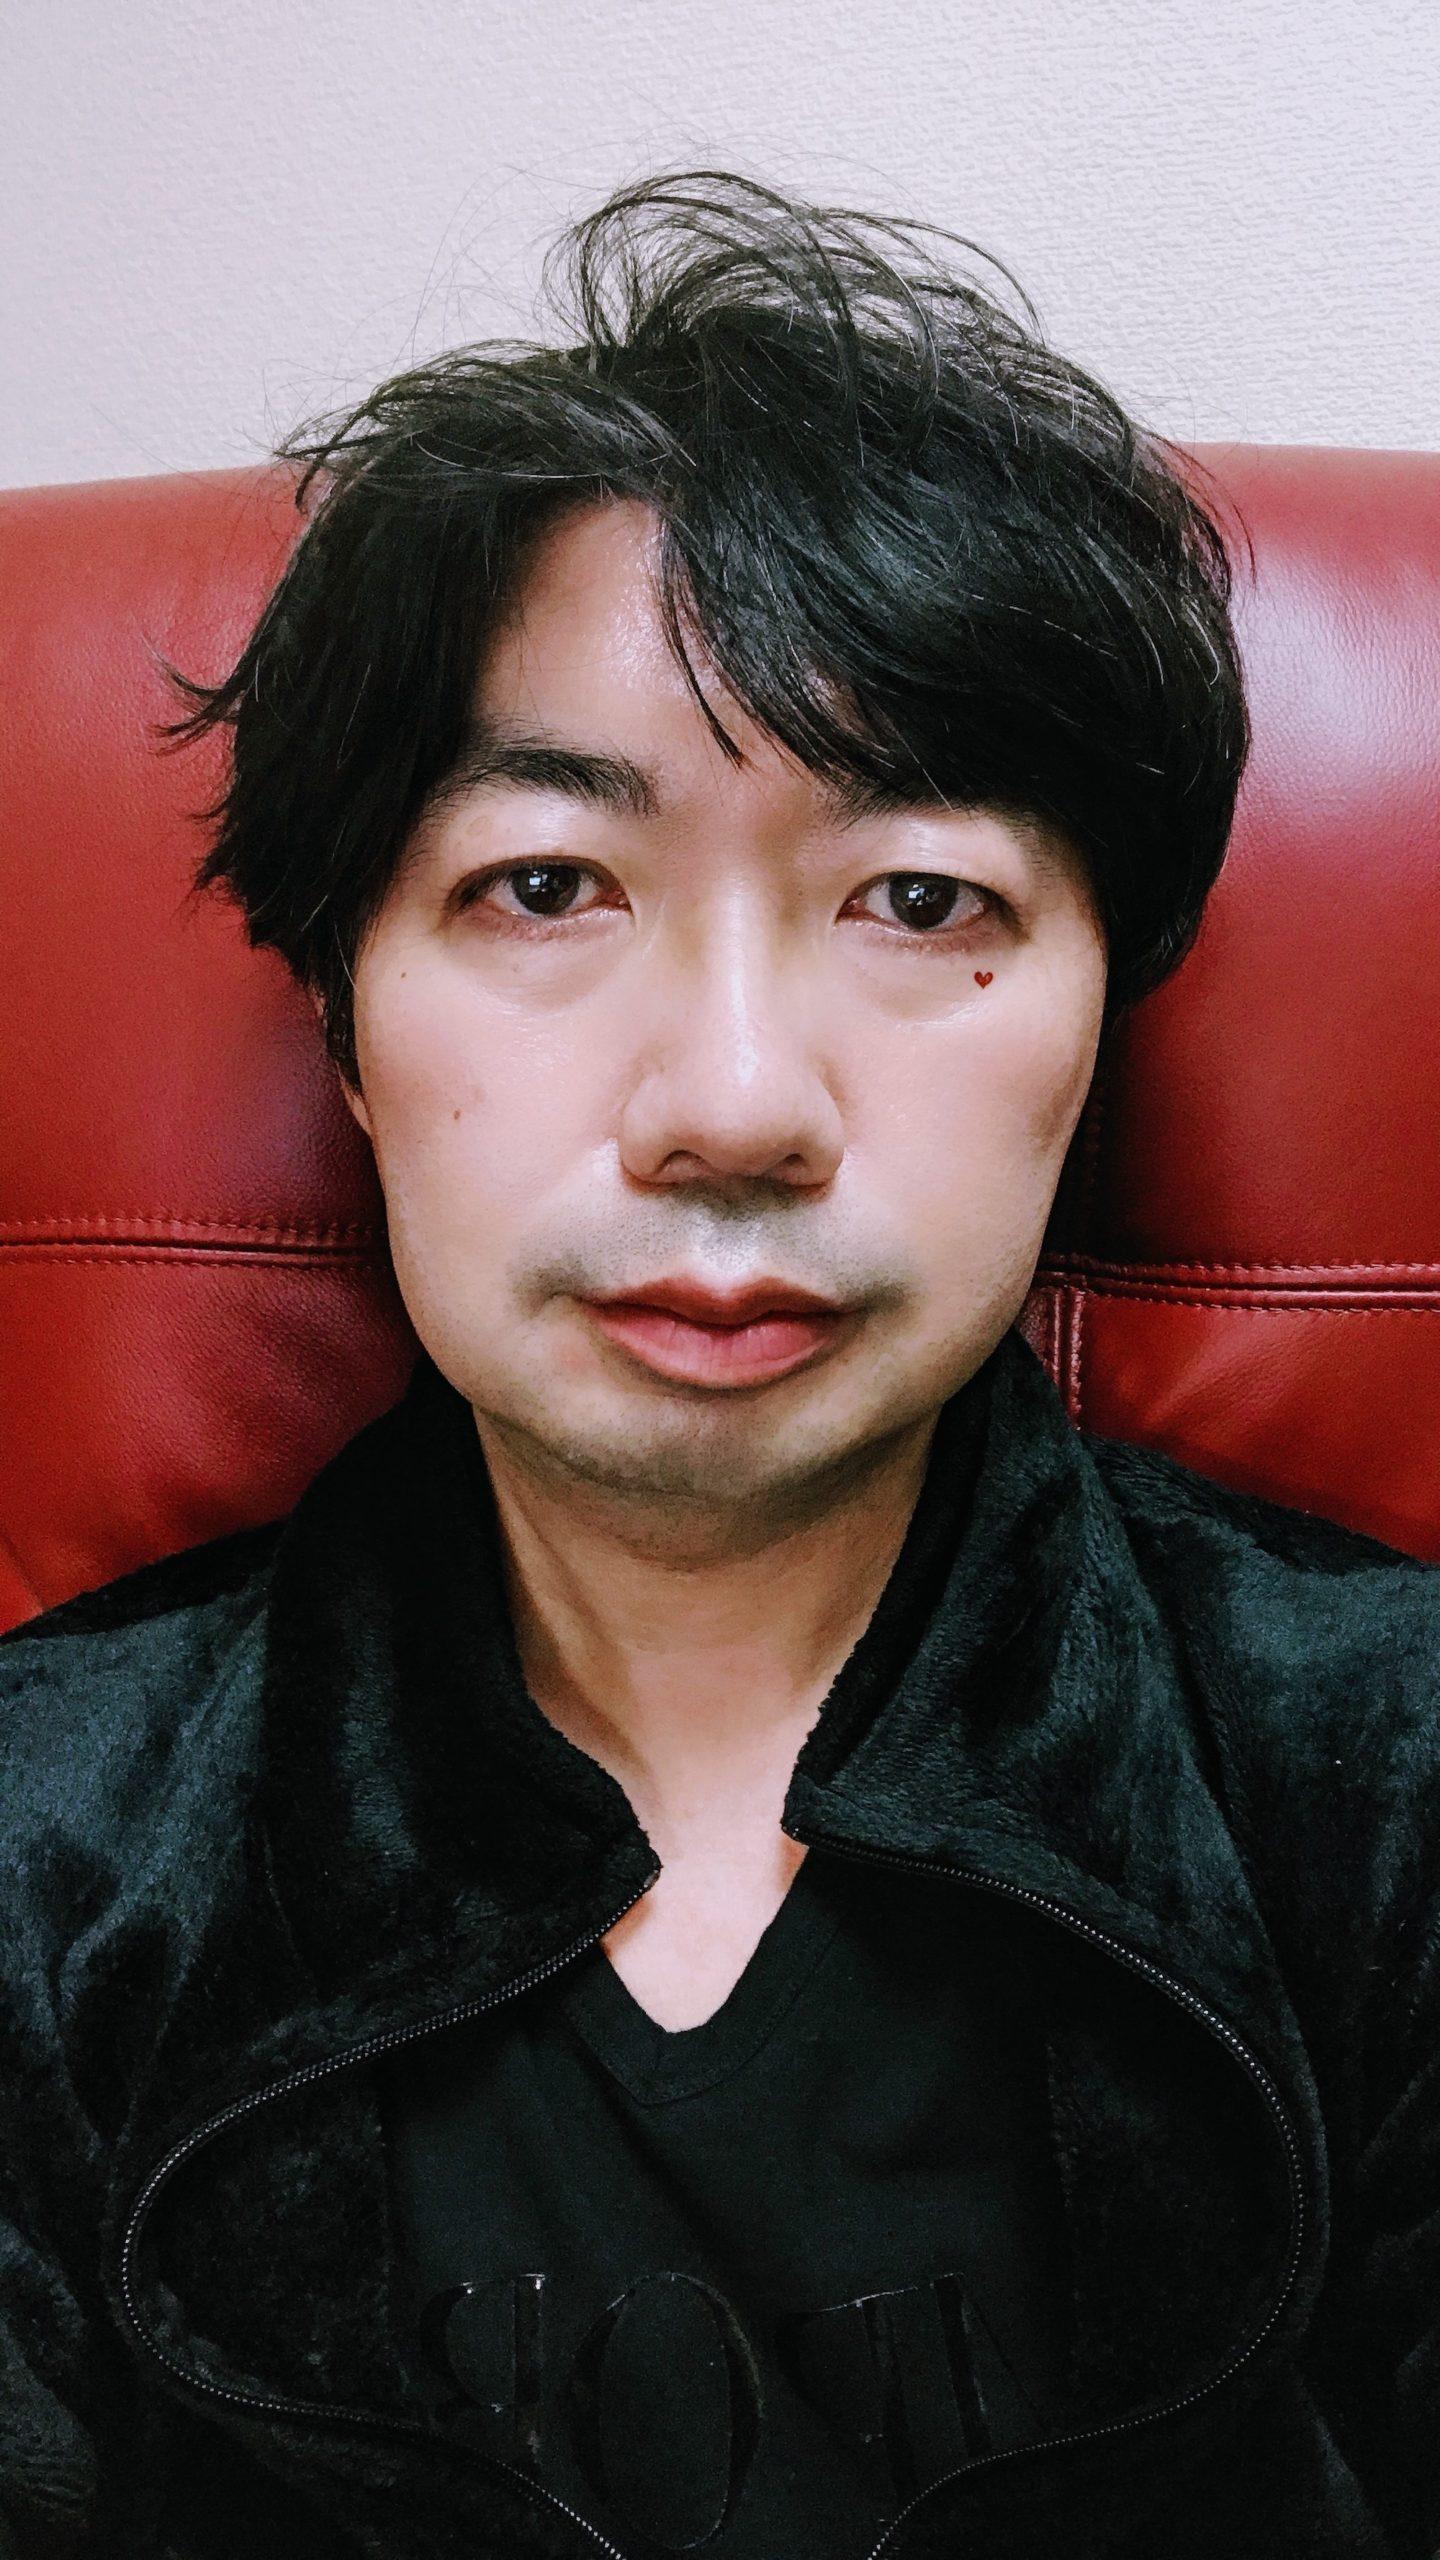 SHUN ONLINE(樺澤俊悟)2020年1月26日、東京都渋谷区にて